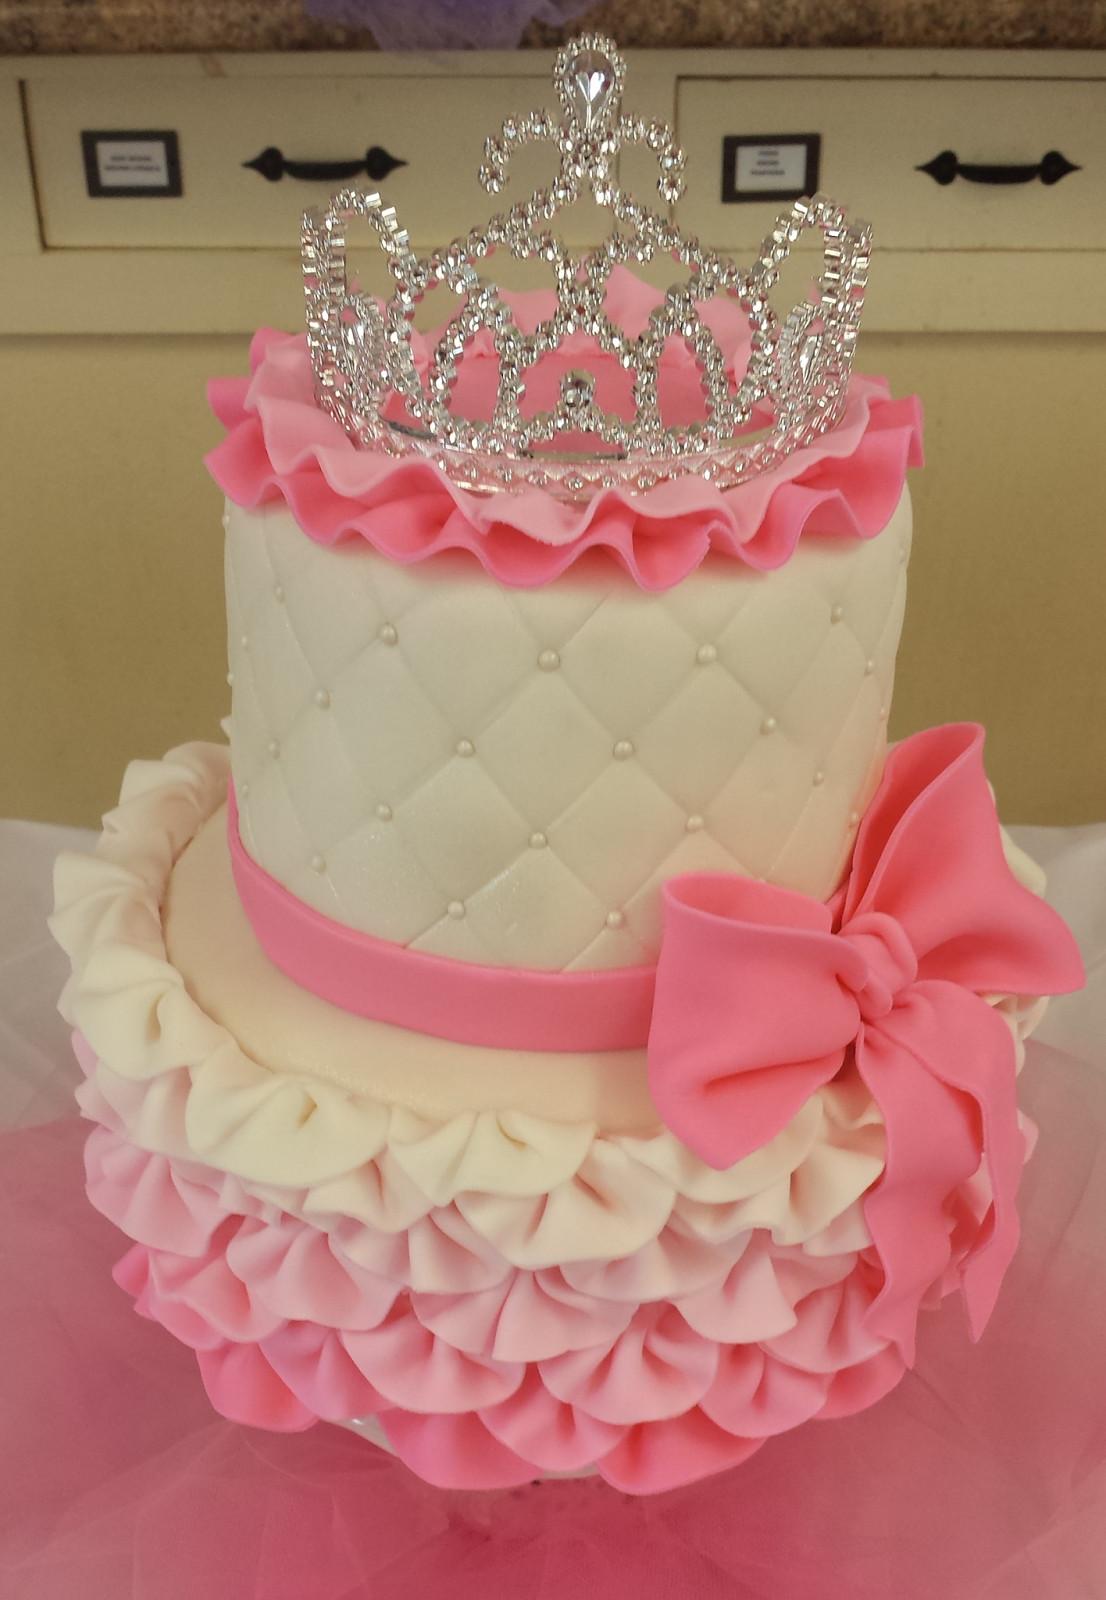 Best ideas about Princes Birthday Cake . Save or Pin Cake Blog Princess Cake Tutorial Now.